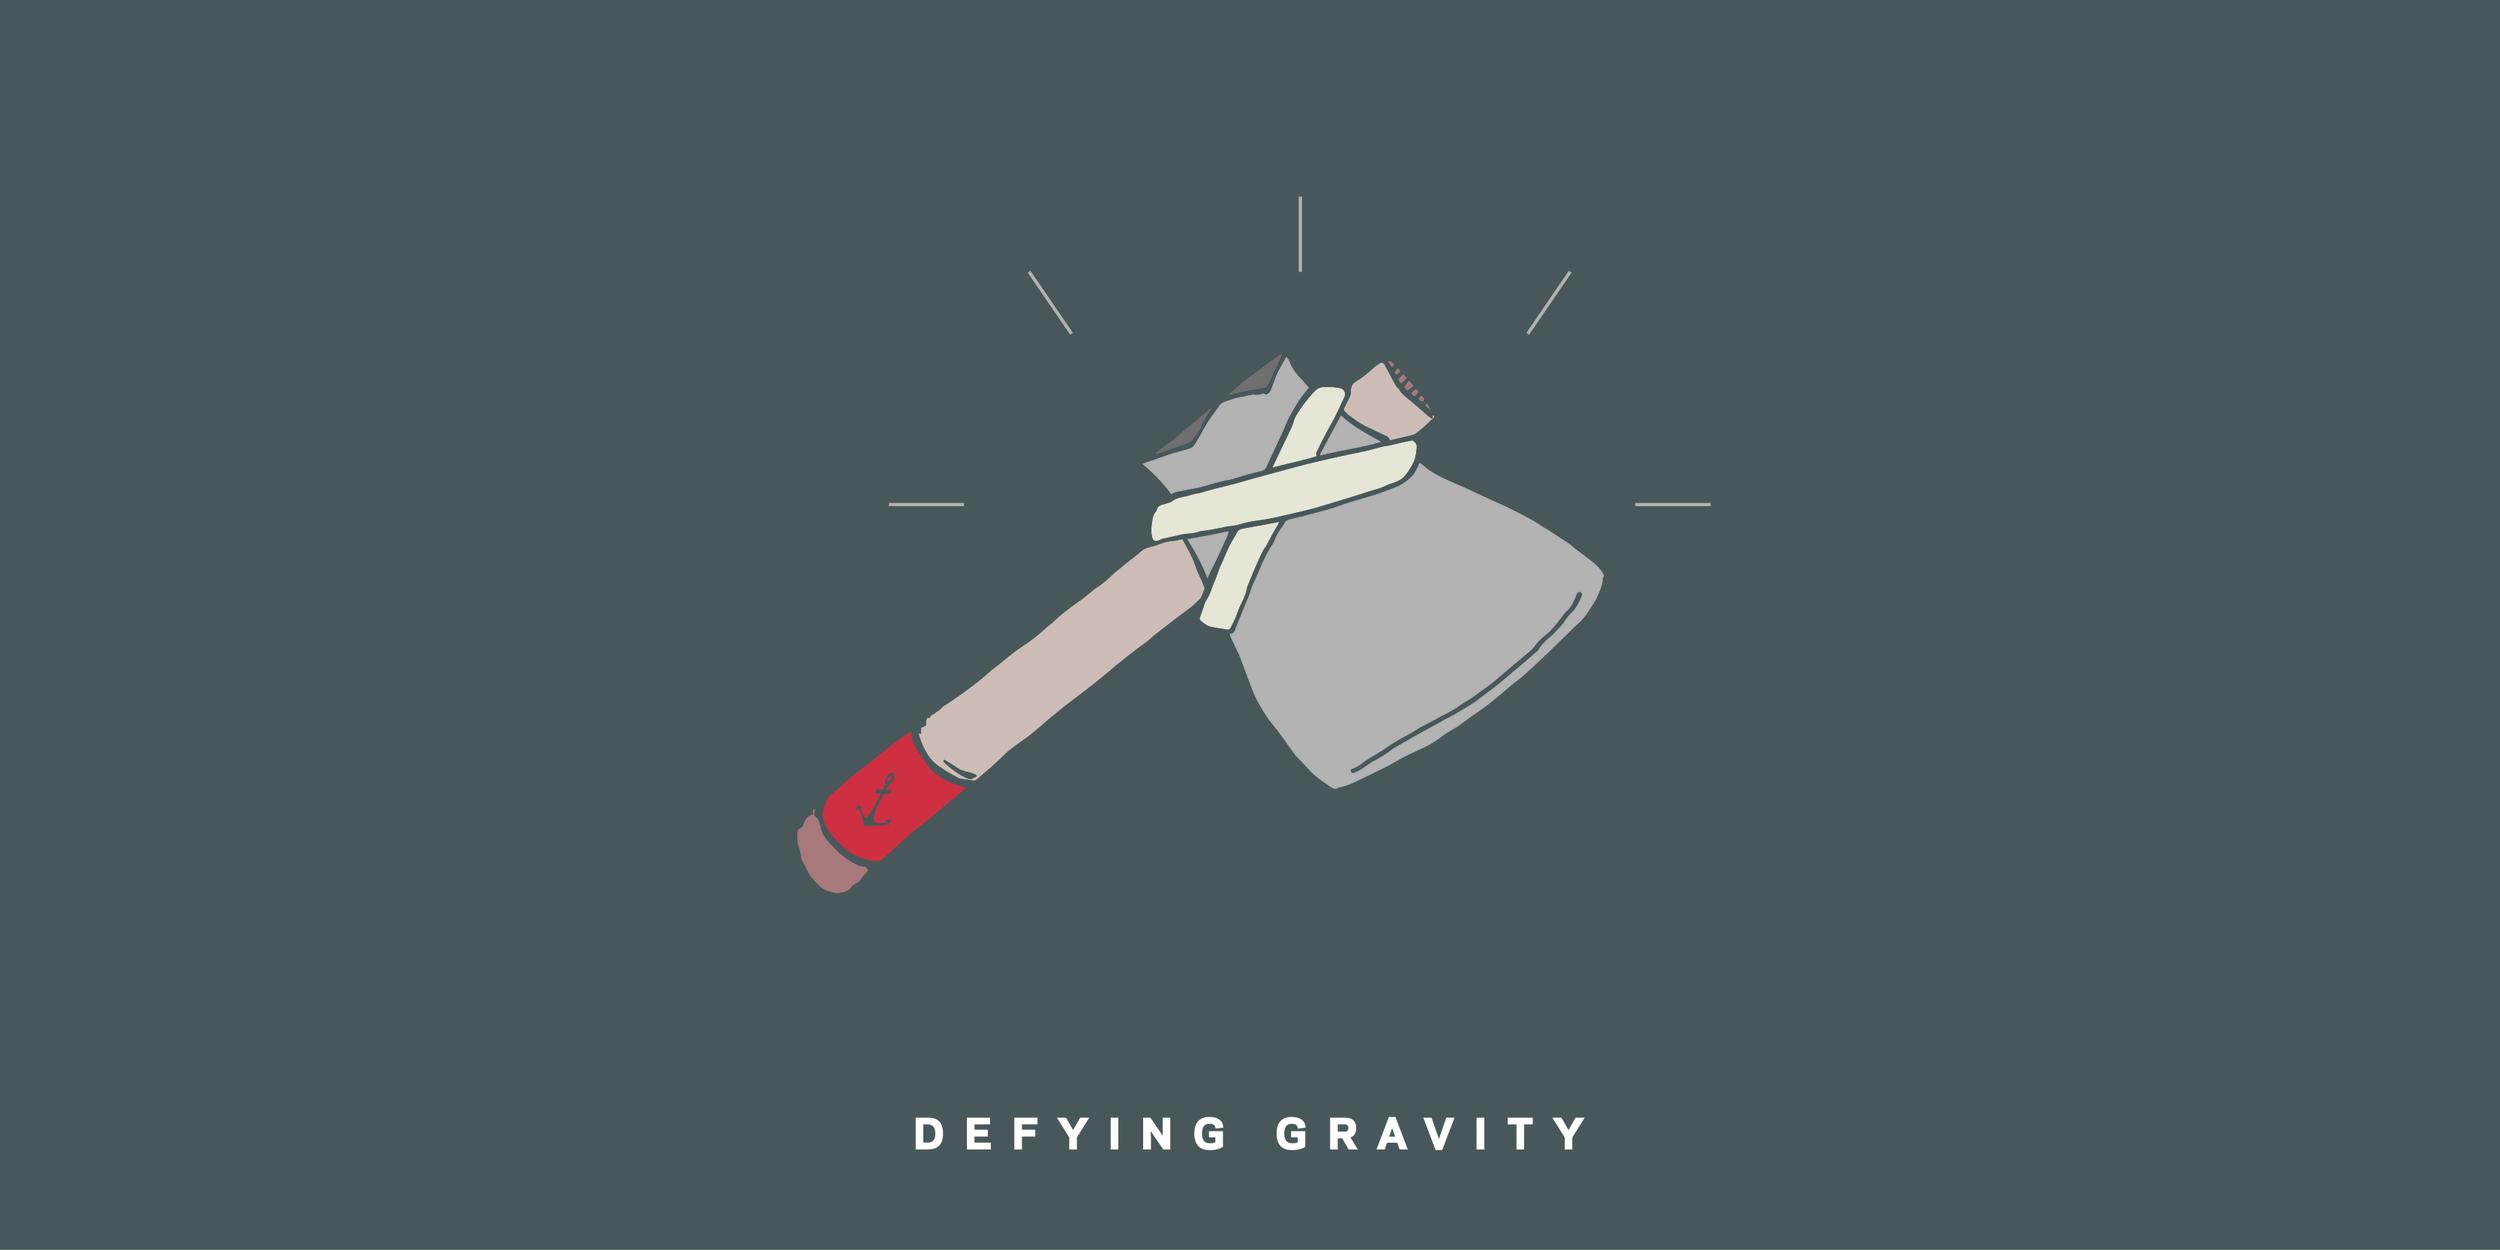 defyinggravity.jpg